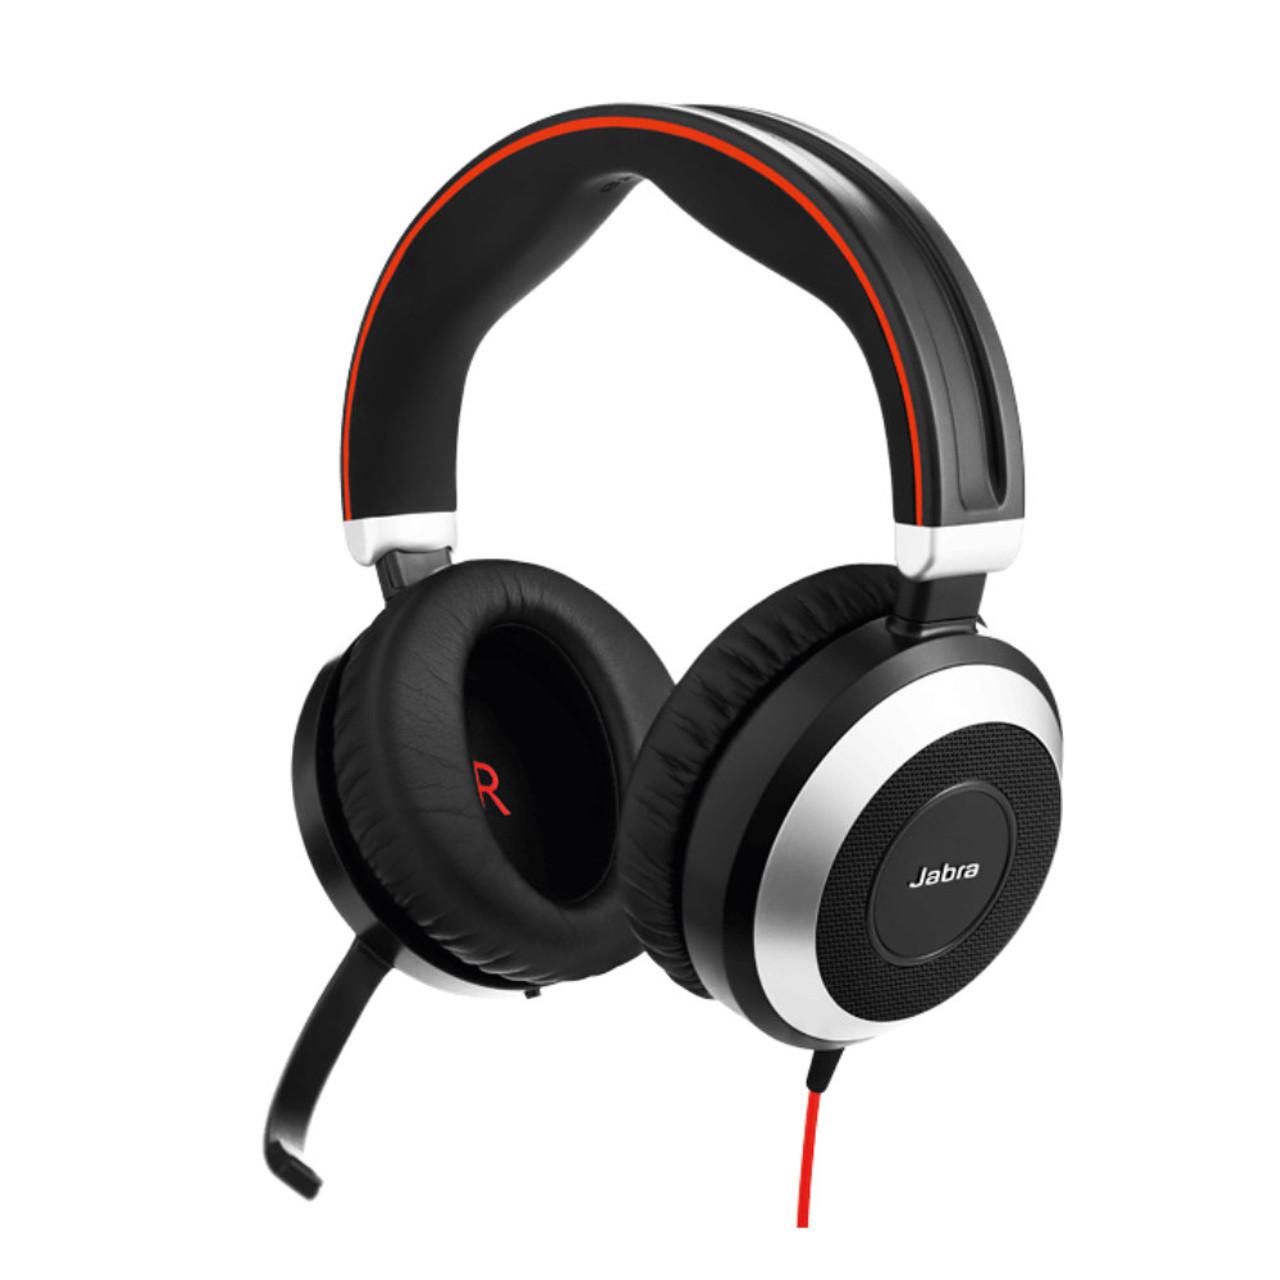 Jabra Singapore Jabra Evolve 80 Ms Stereo Active Noise Cancelling Usb Headset